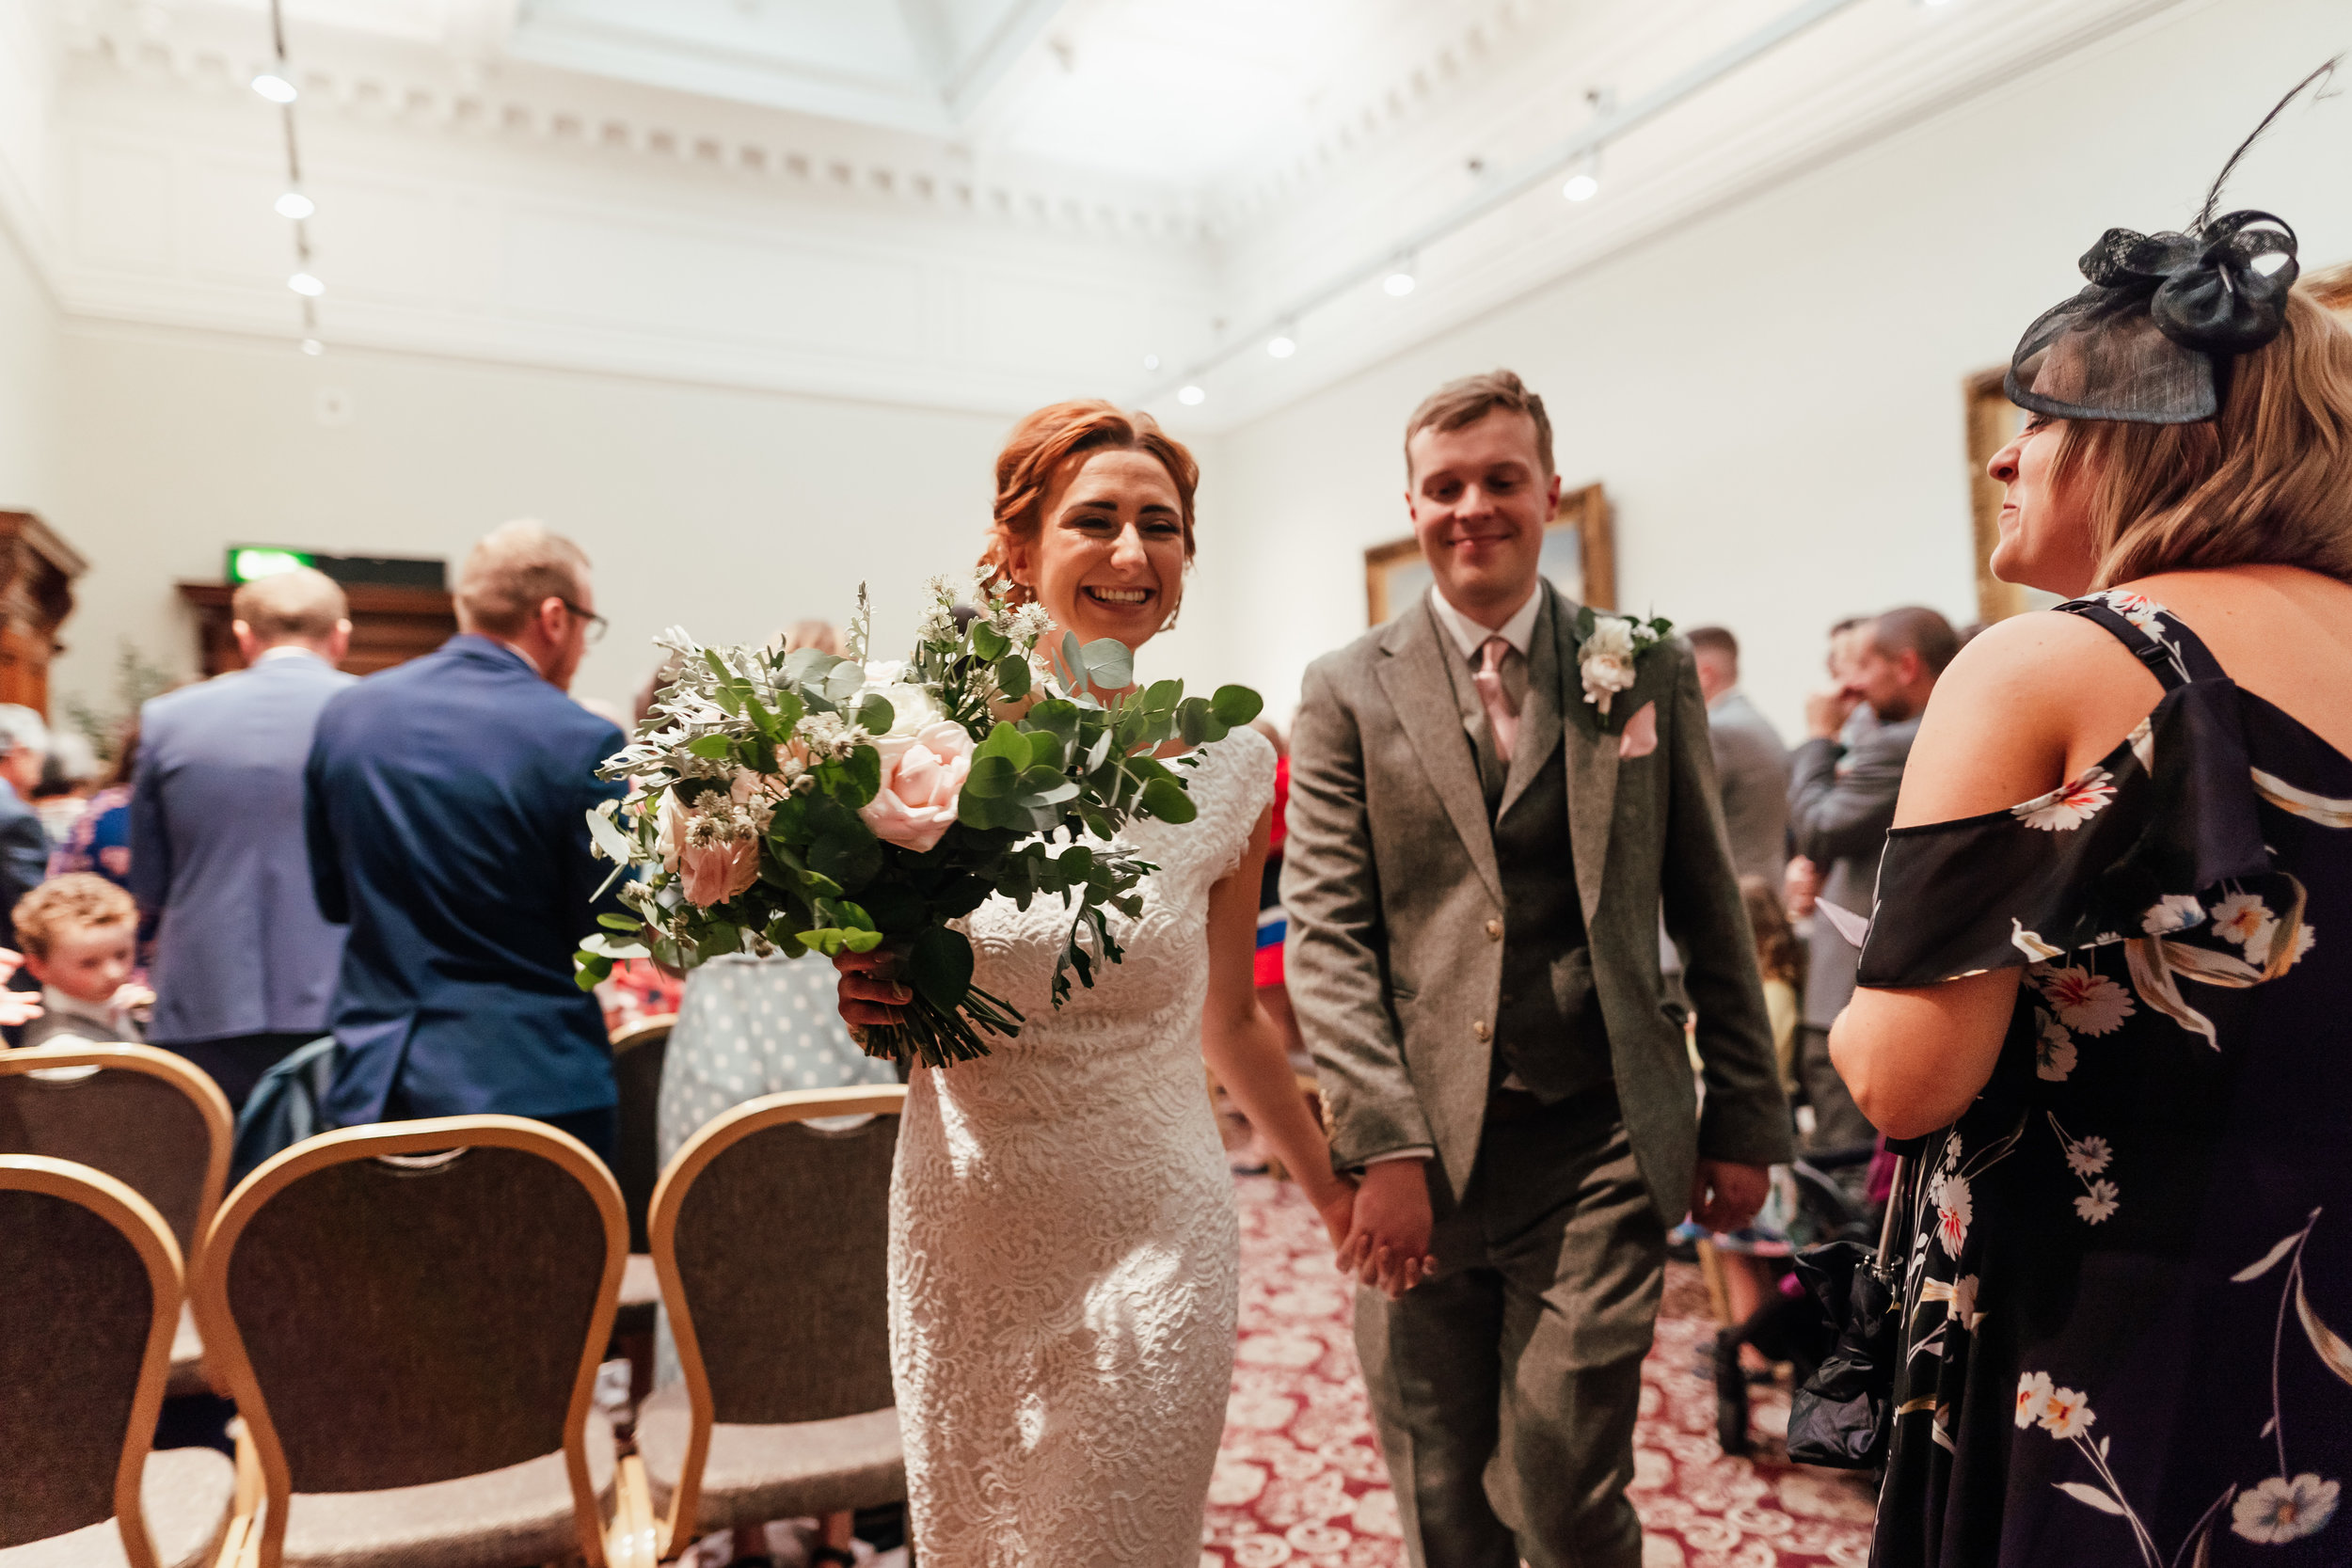 st-georges-hall-liverpool-wedding-122.jpg